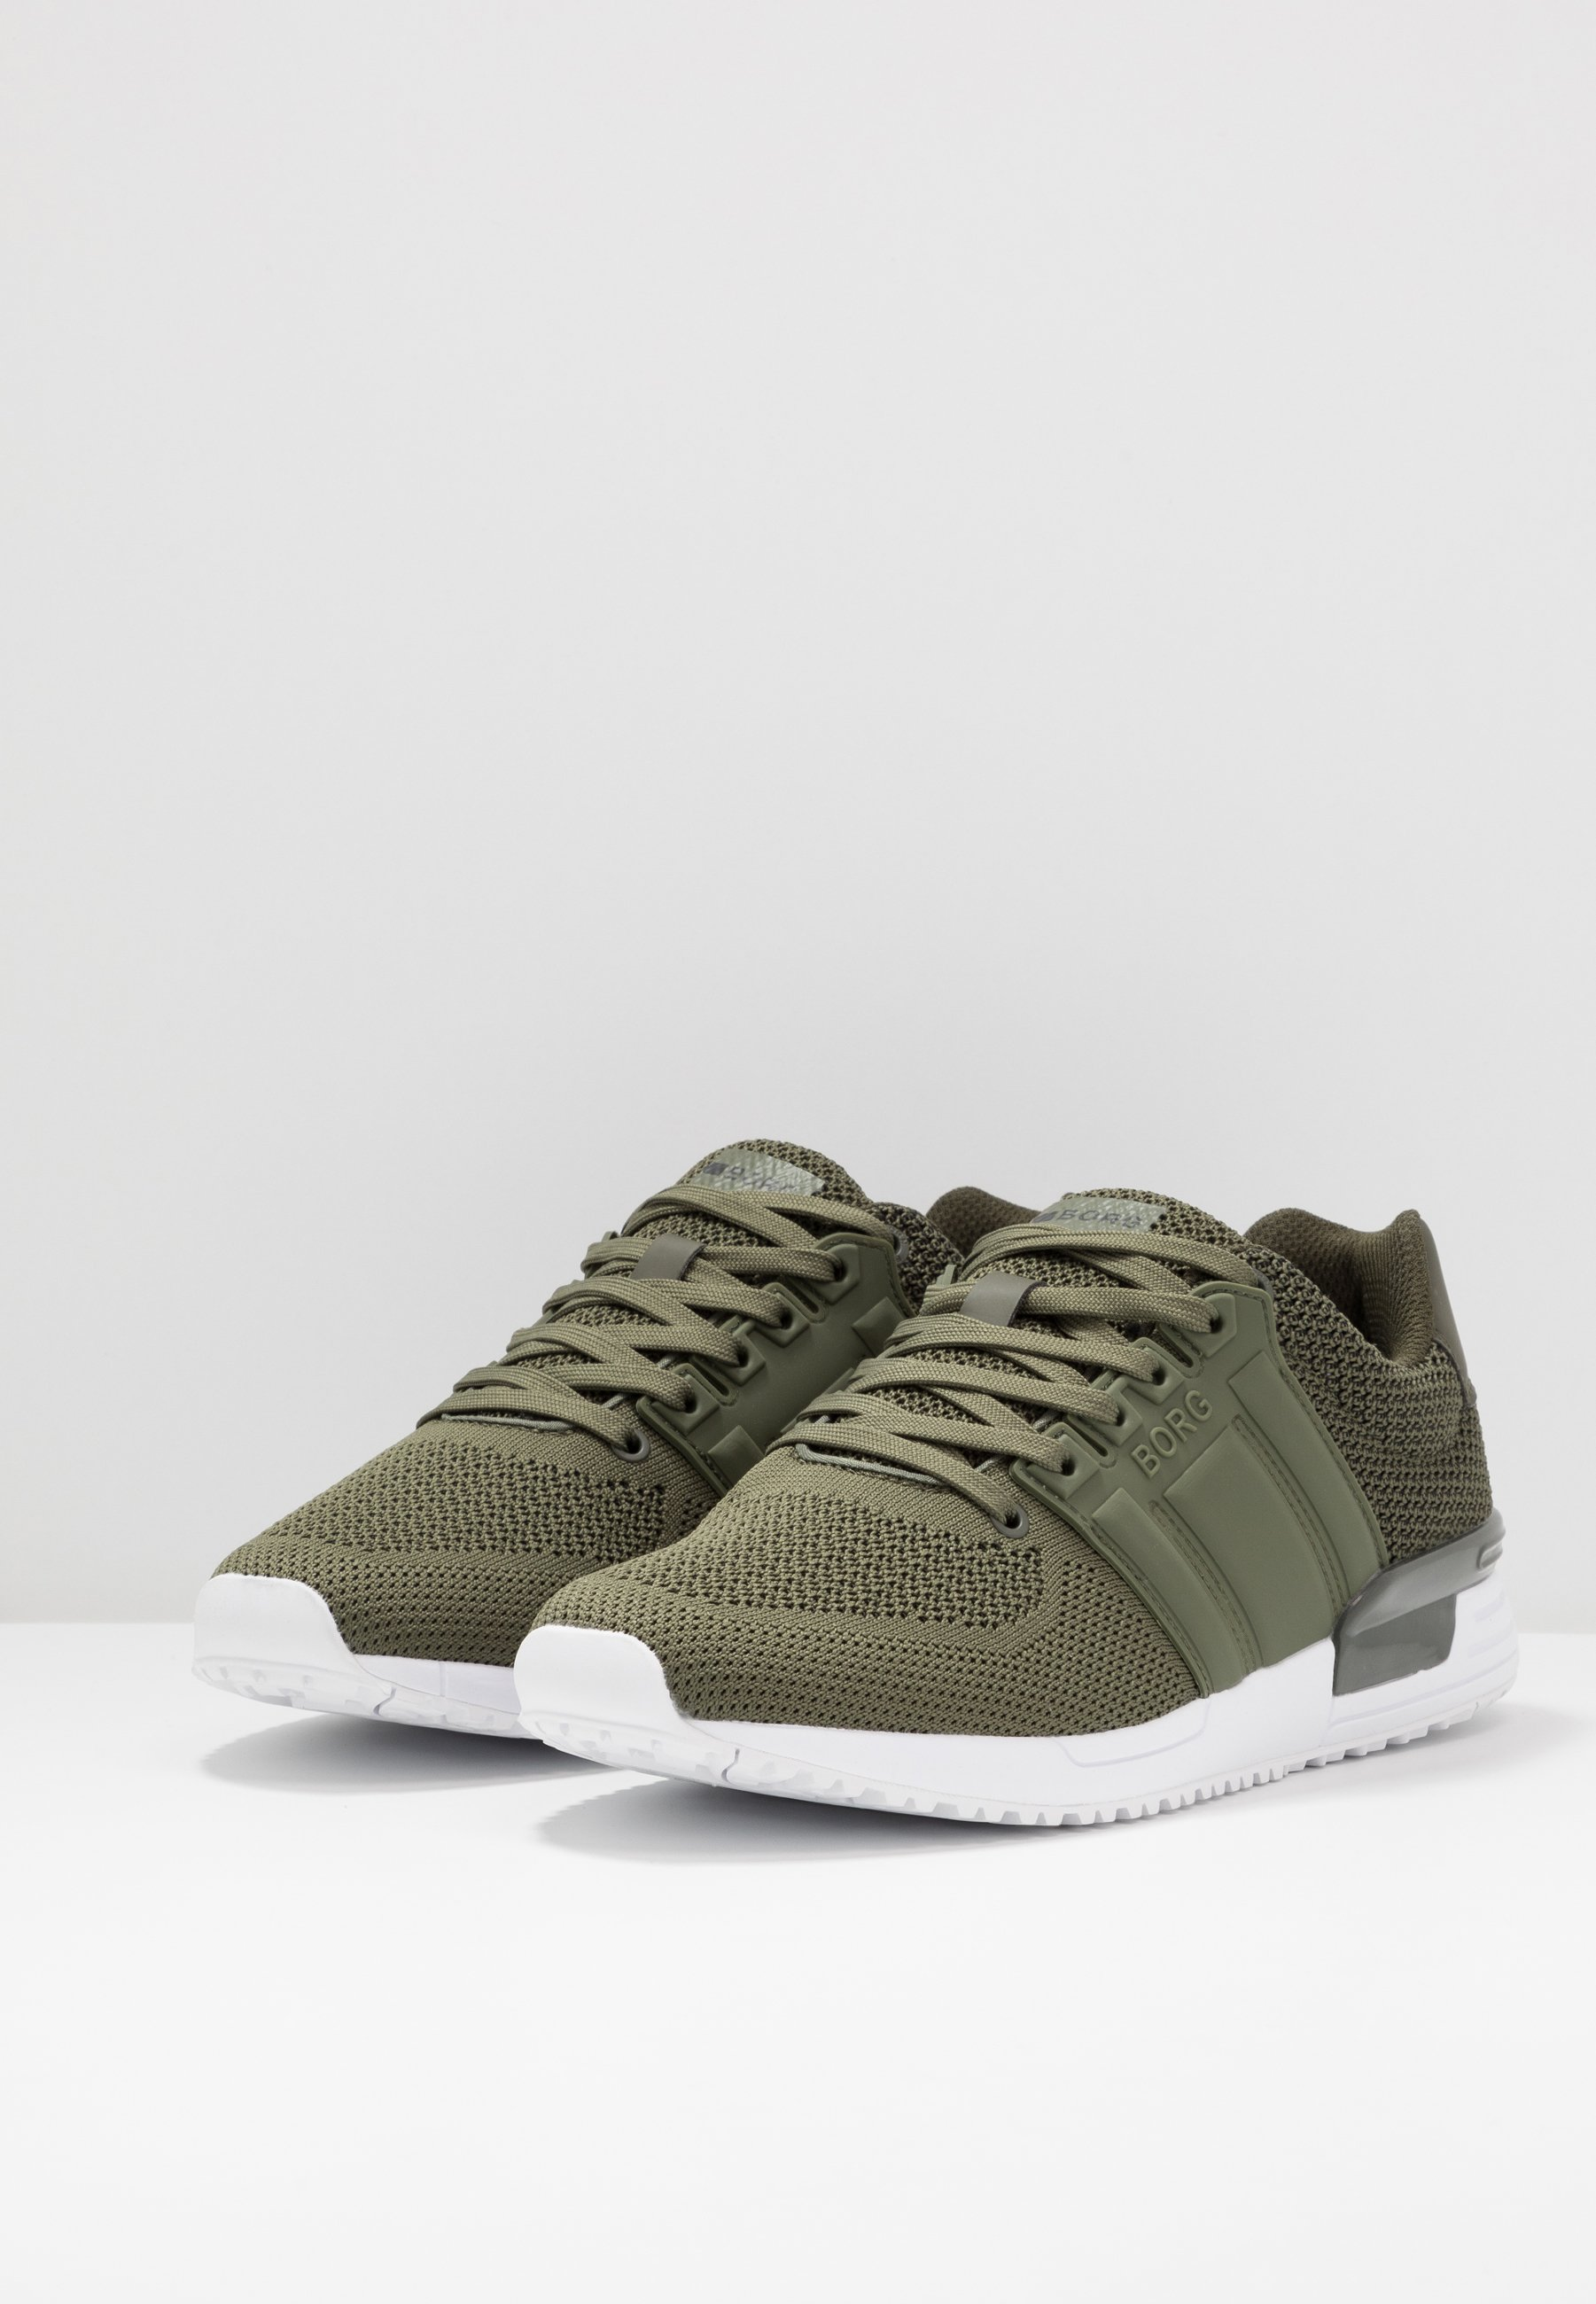 Bj?rn Borg Sneakers Basse - Olive Fs6P1bA